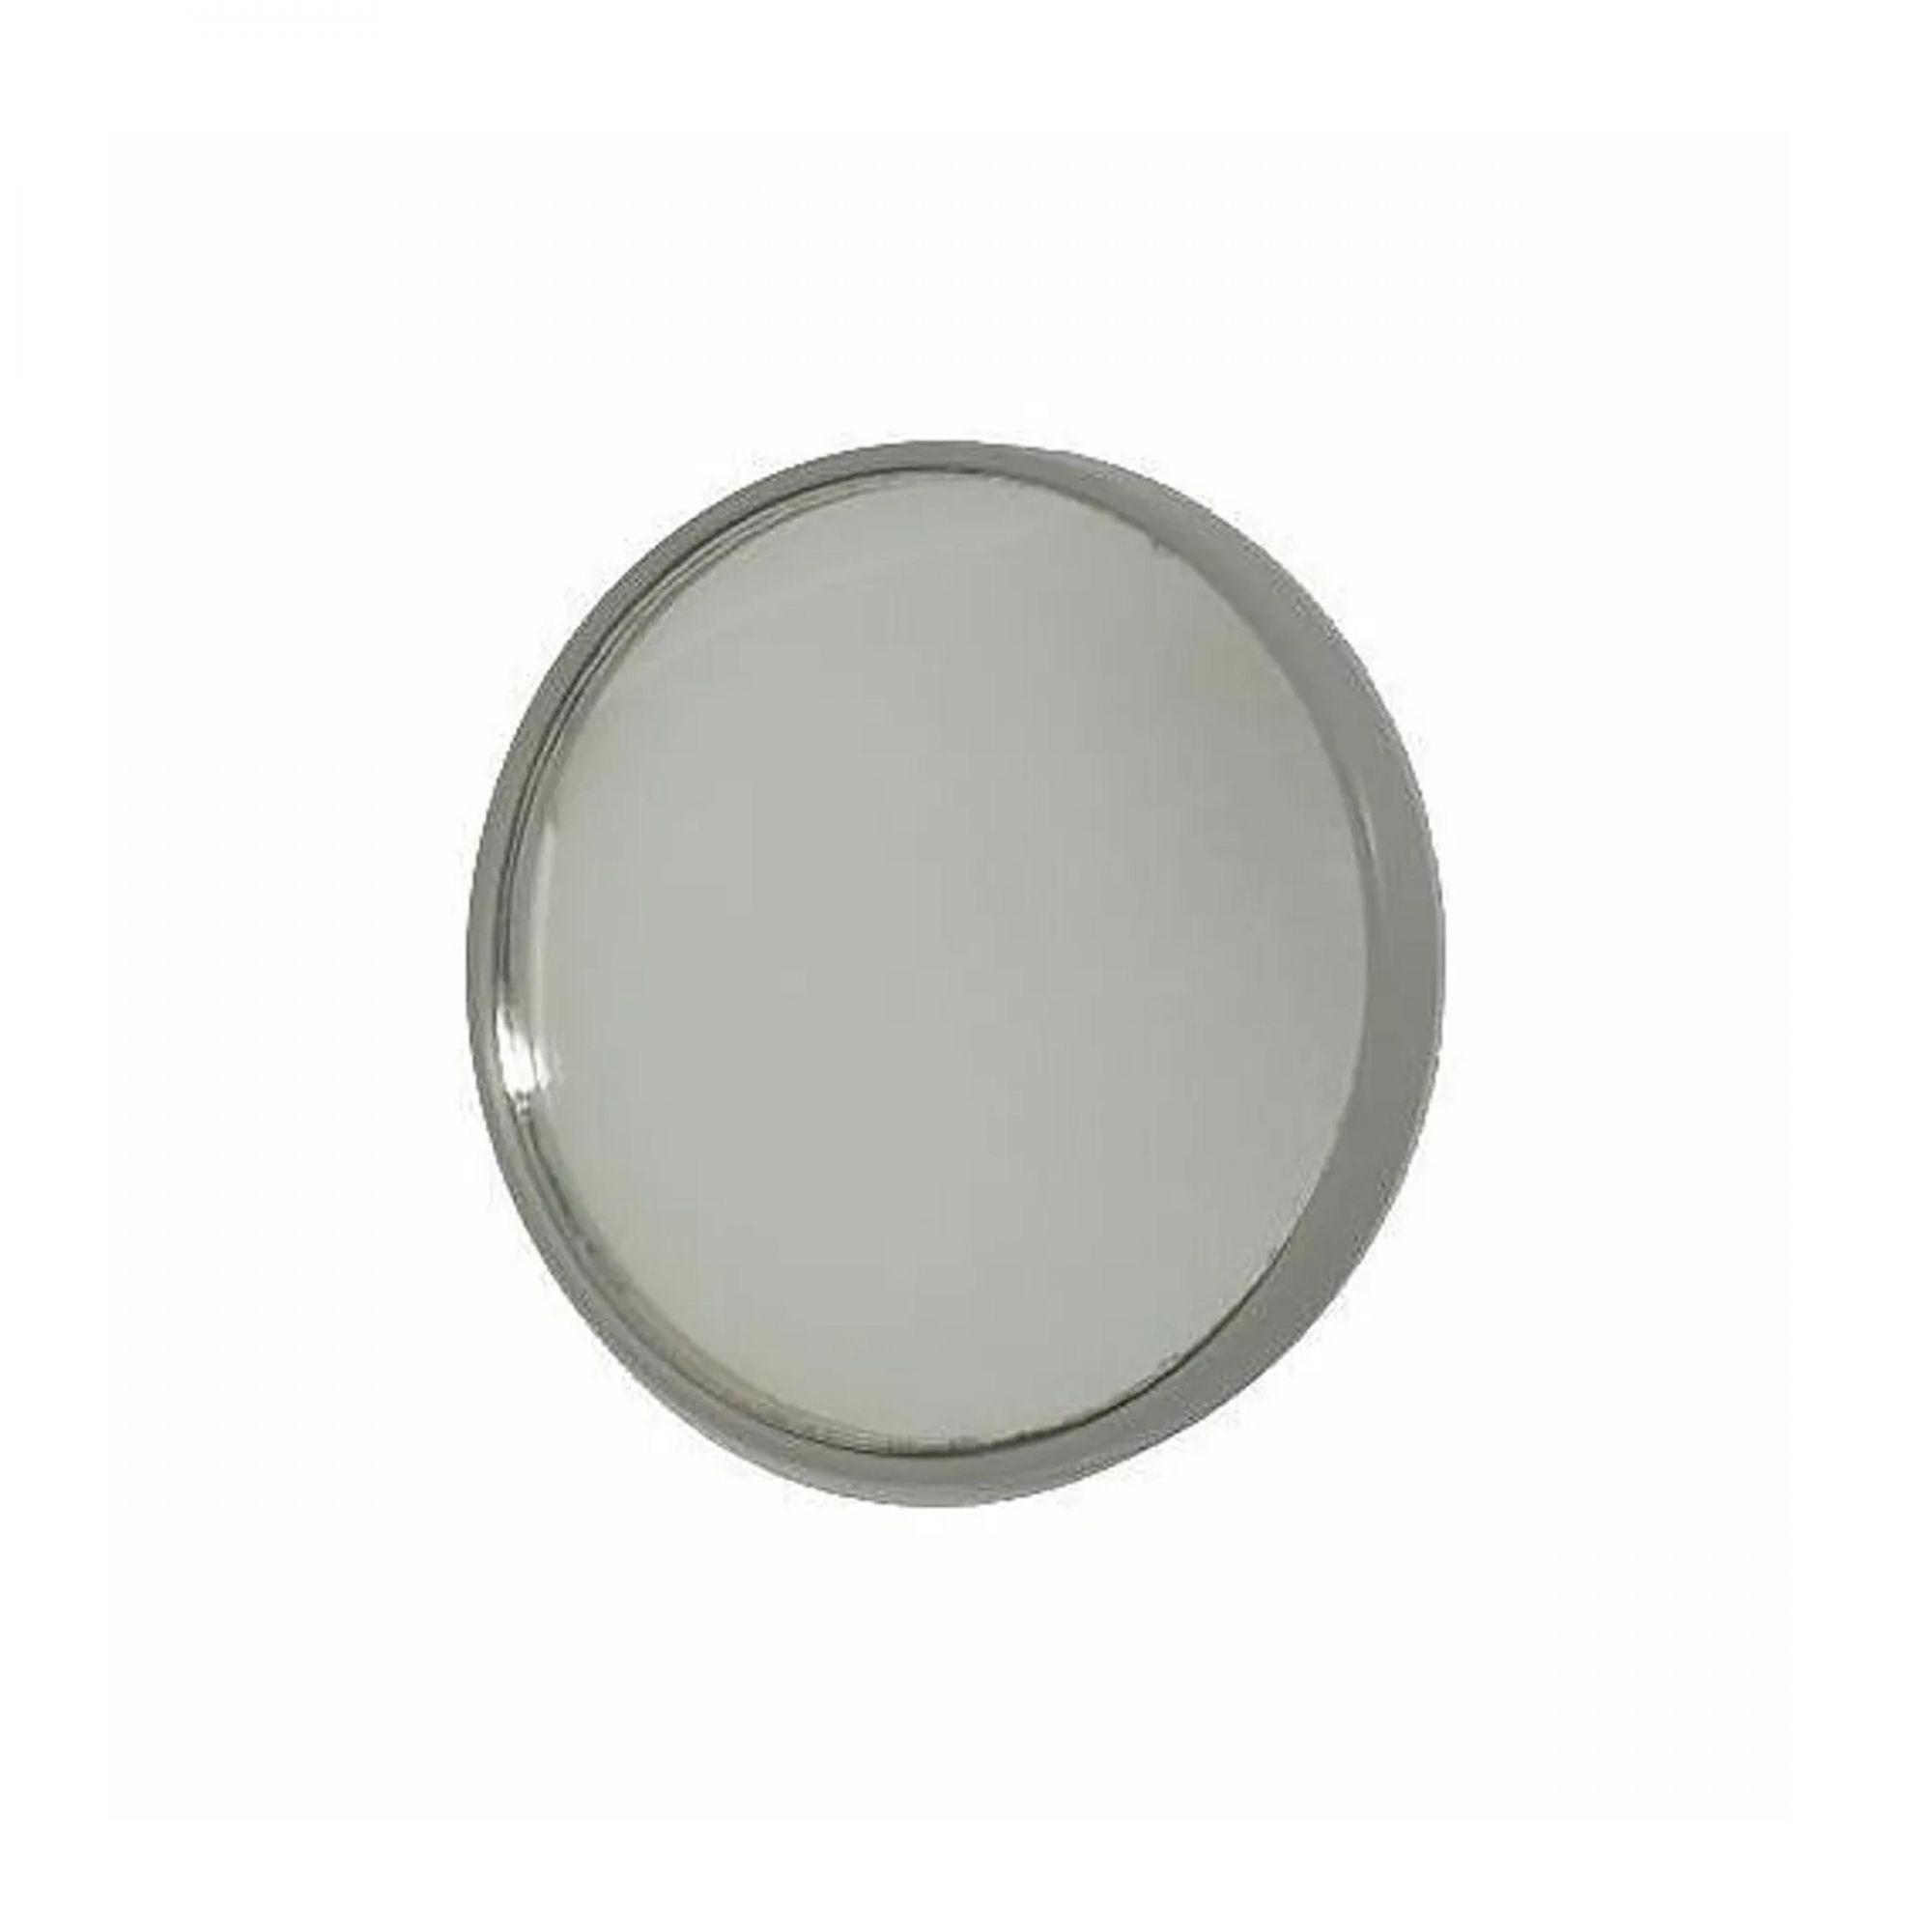 Espelho Auxiliar Diametro 75mm Steelbras - AP13691